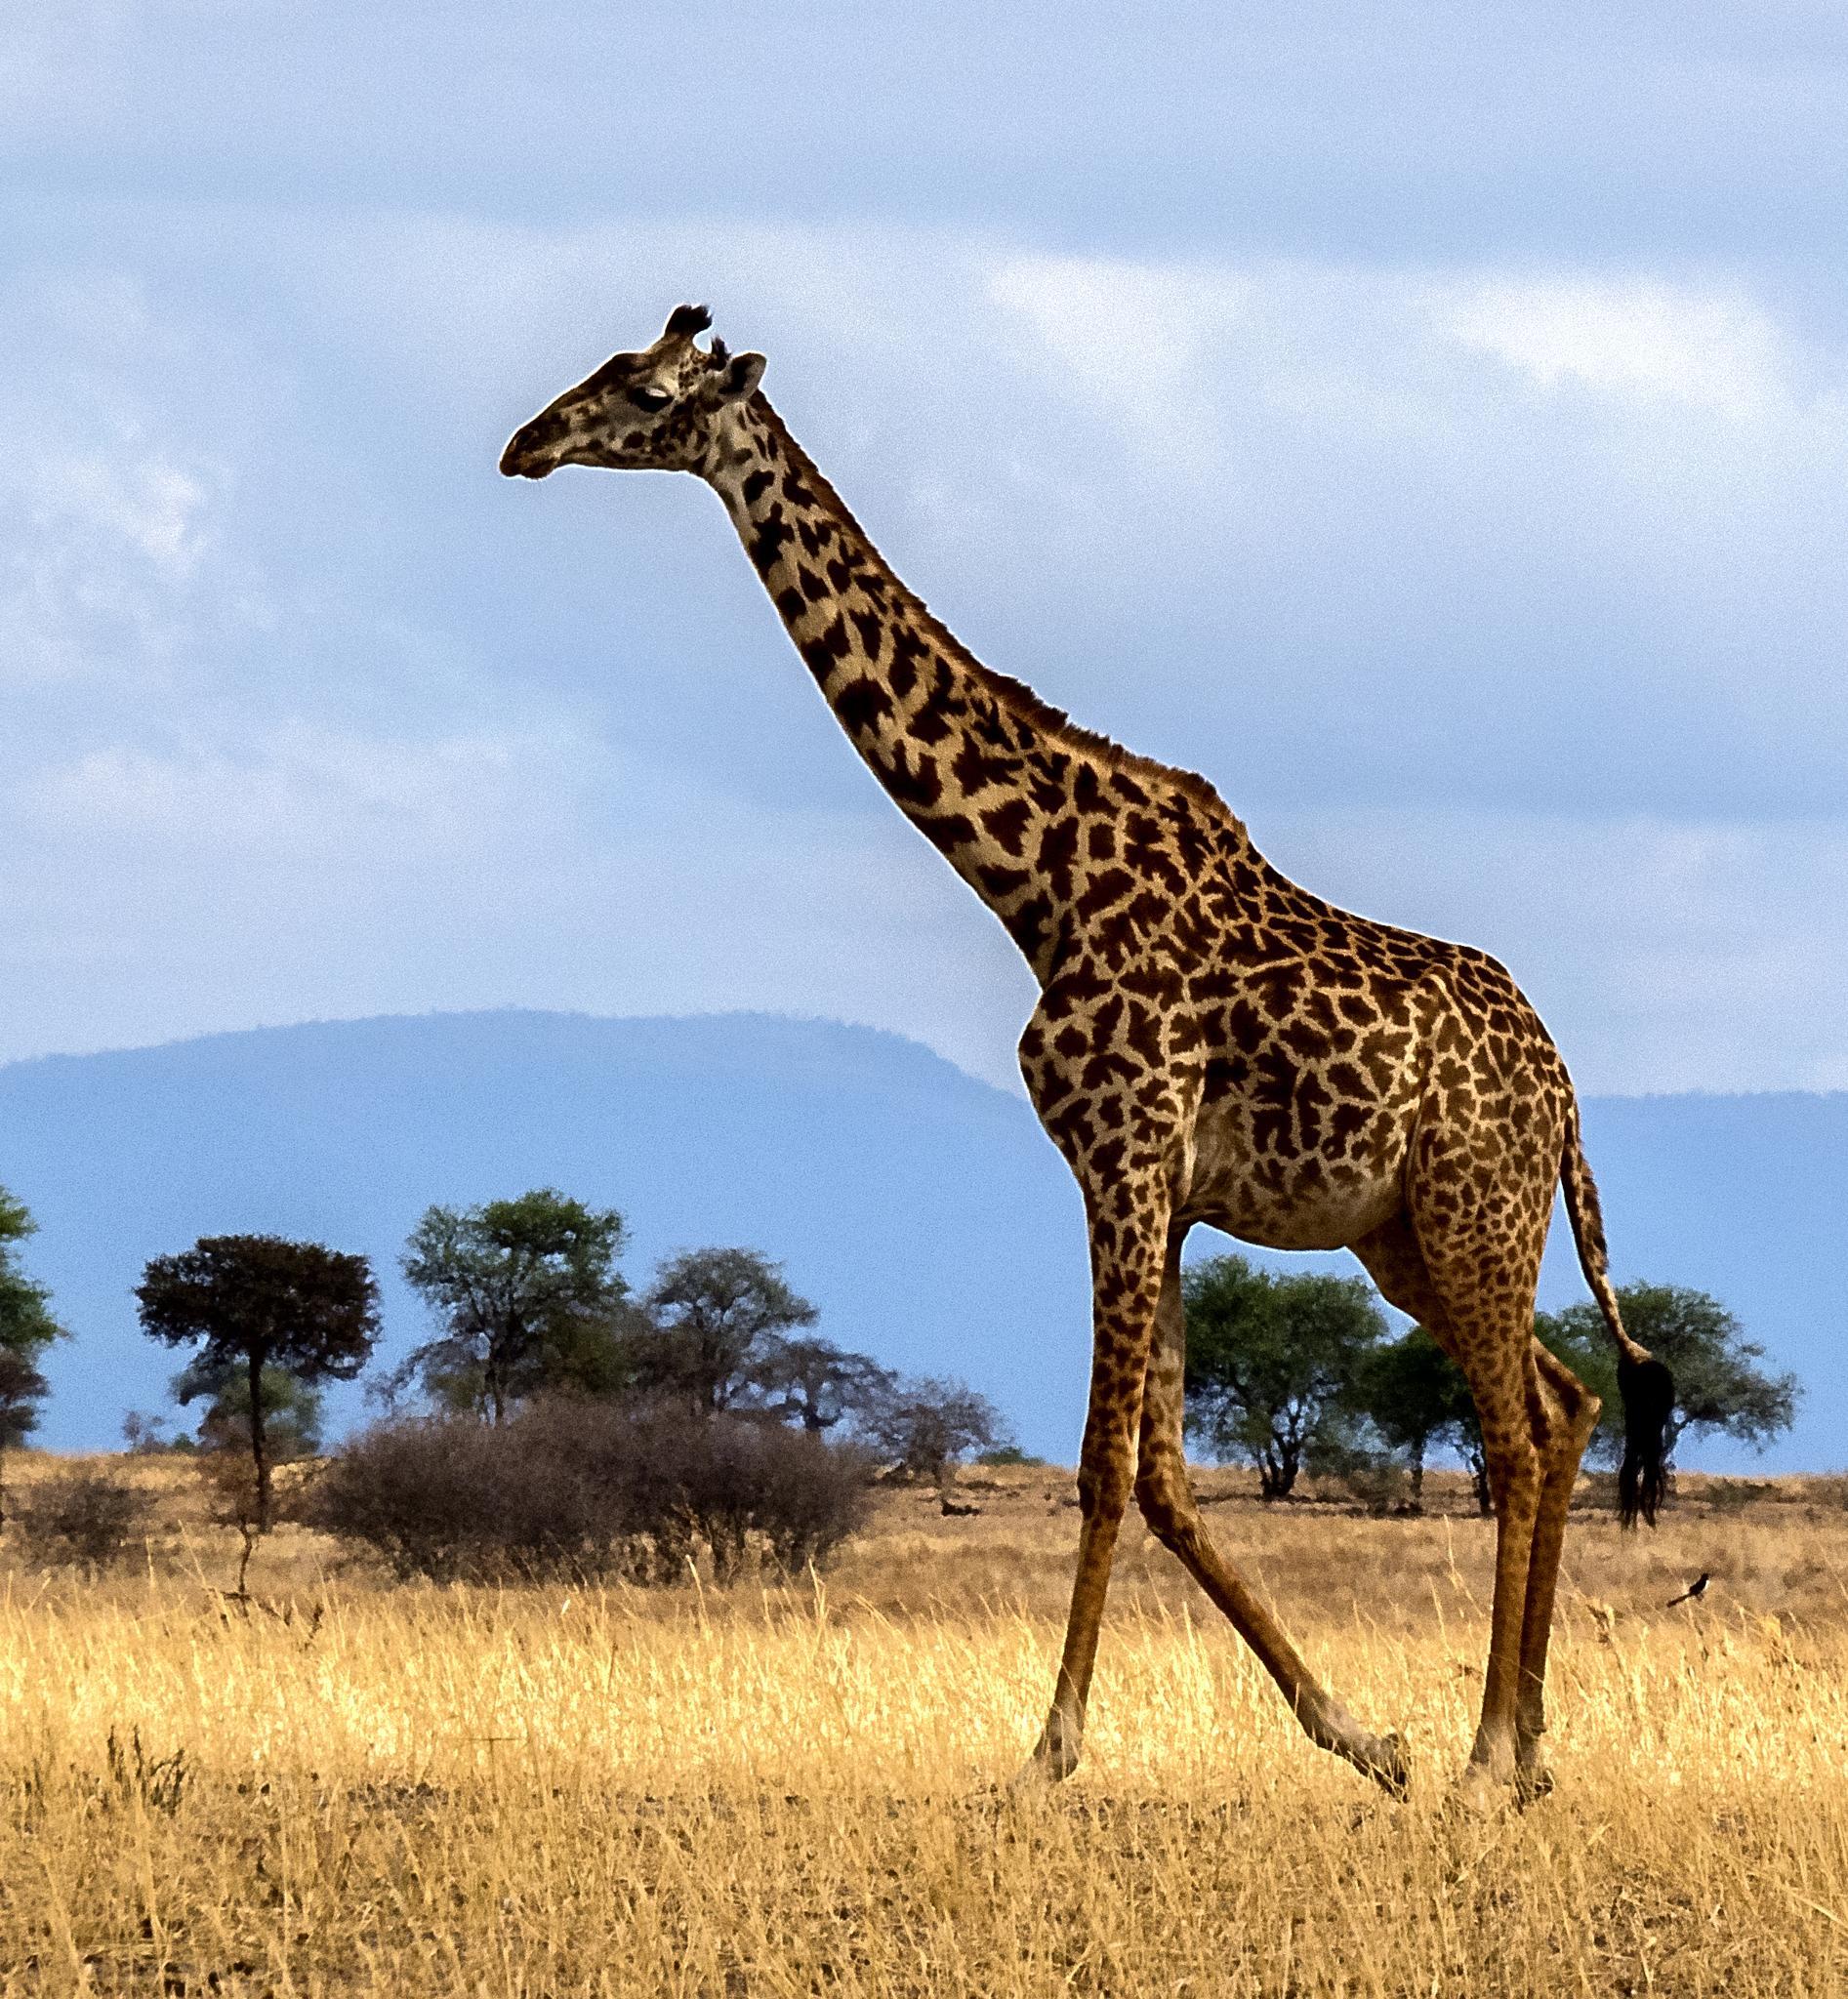 Giraffe by David Owen